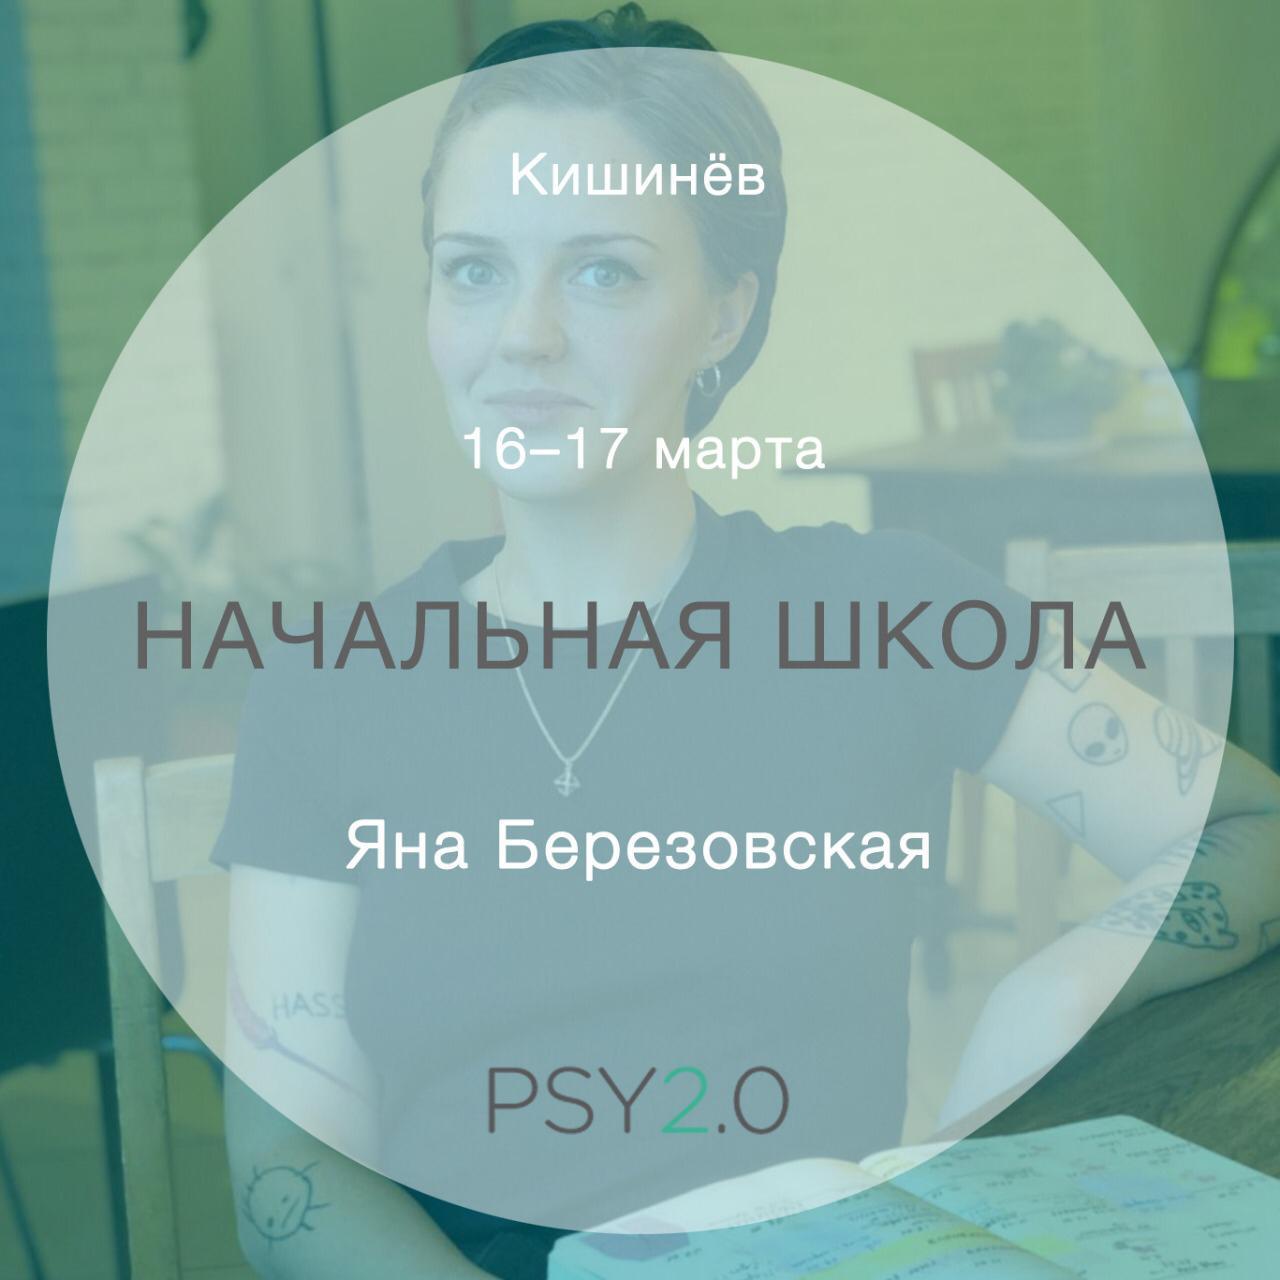 Pilatesmd - семинар по психосоматике